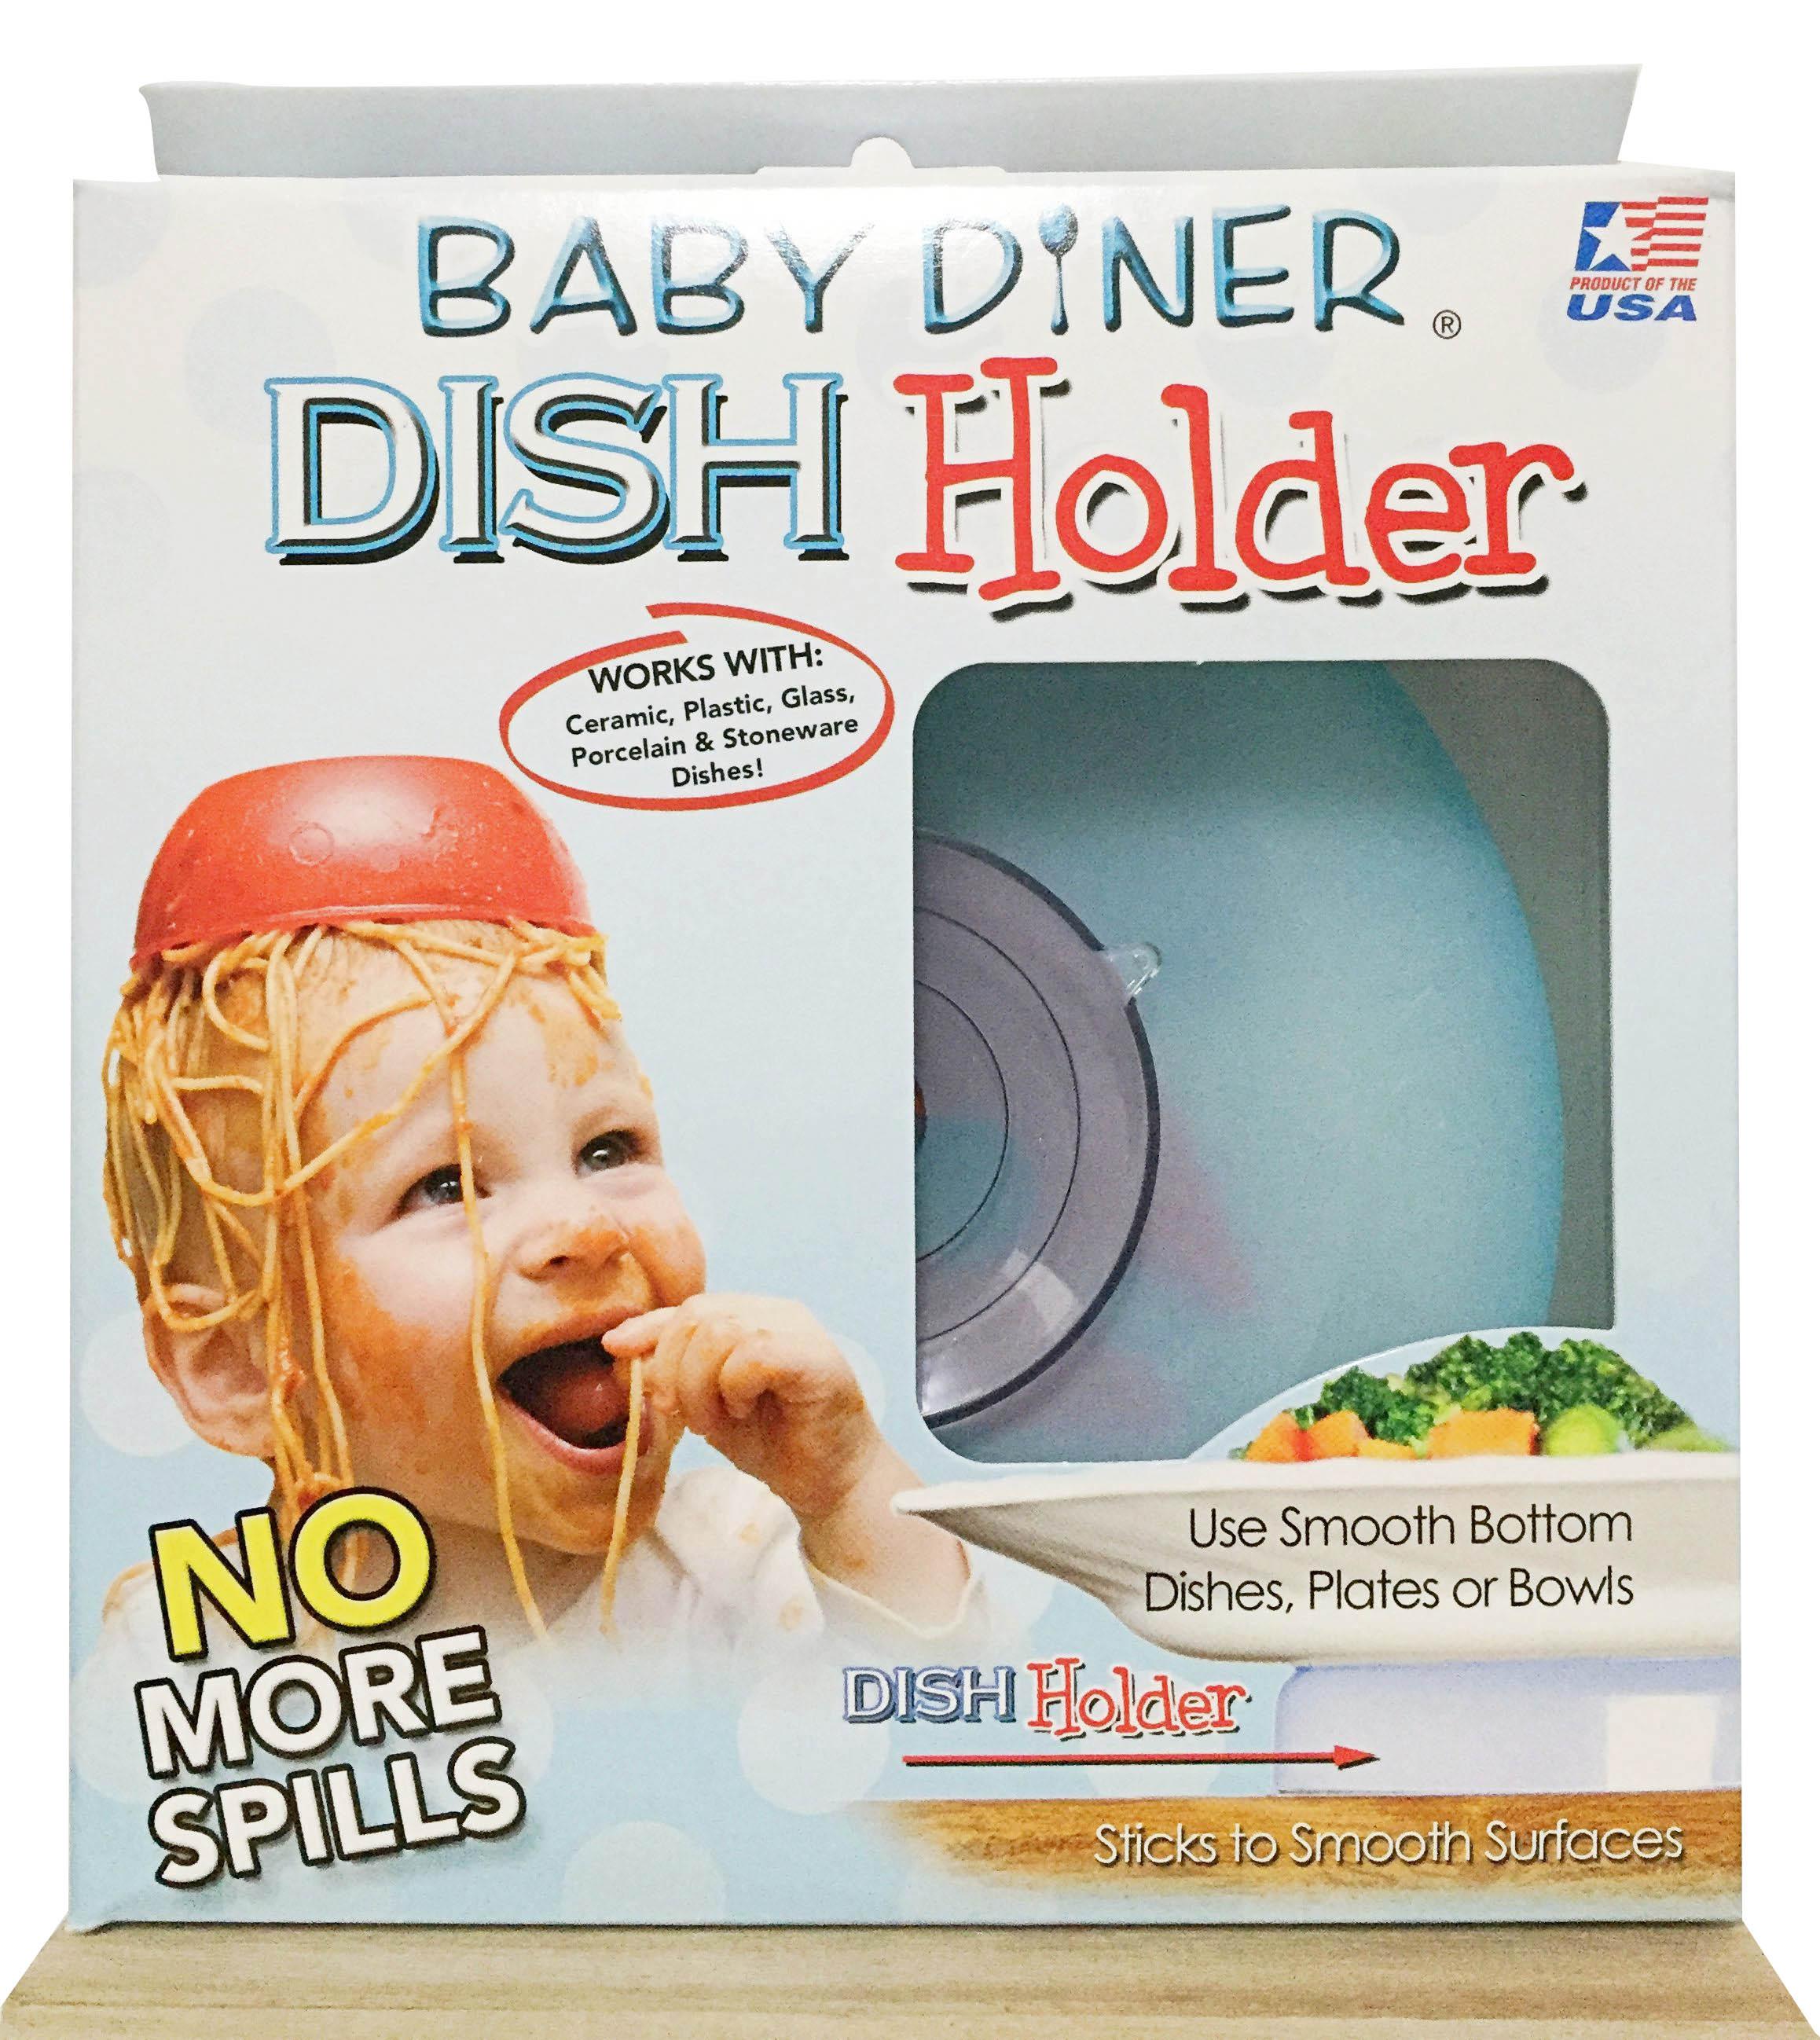 《★Baby Diner Dish Holder 》嬰兒餐具強力吸盤架 美國代購 平行輸入 溫媽媽